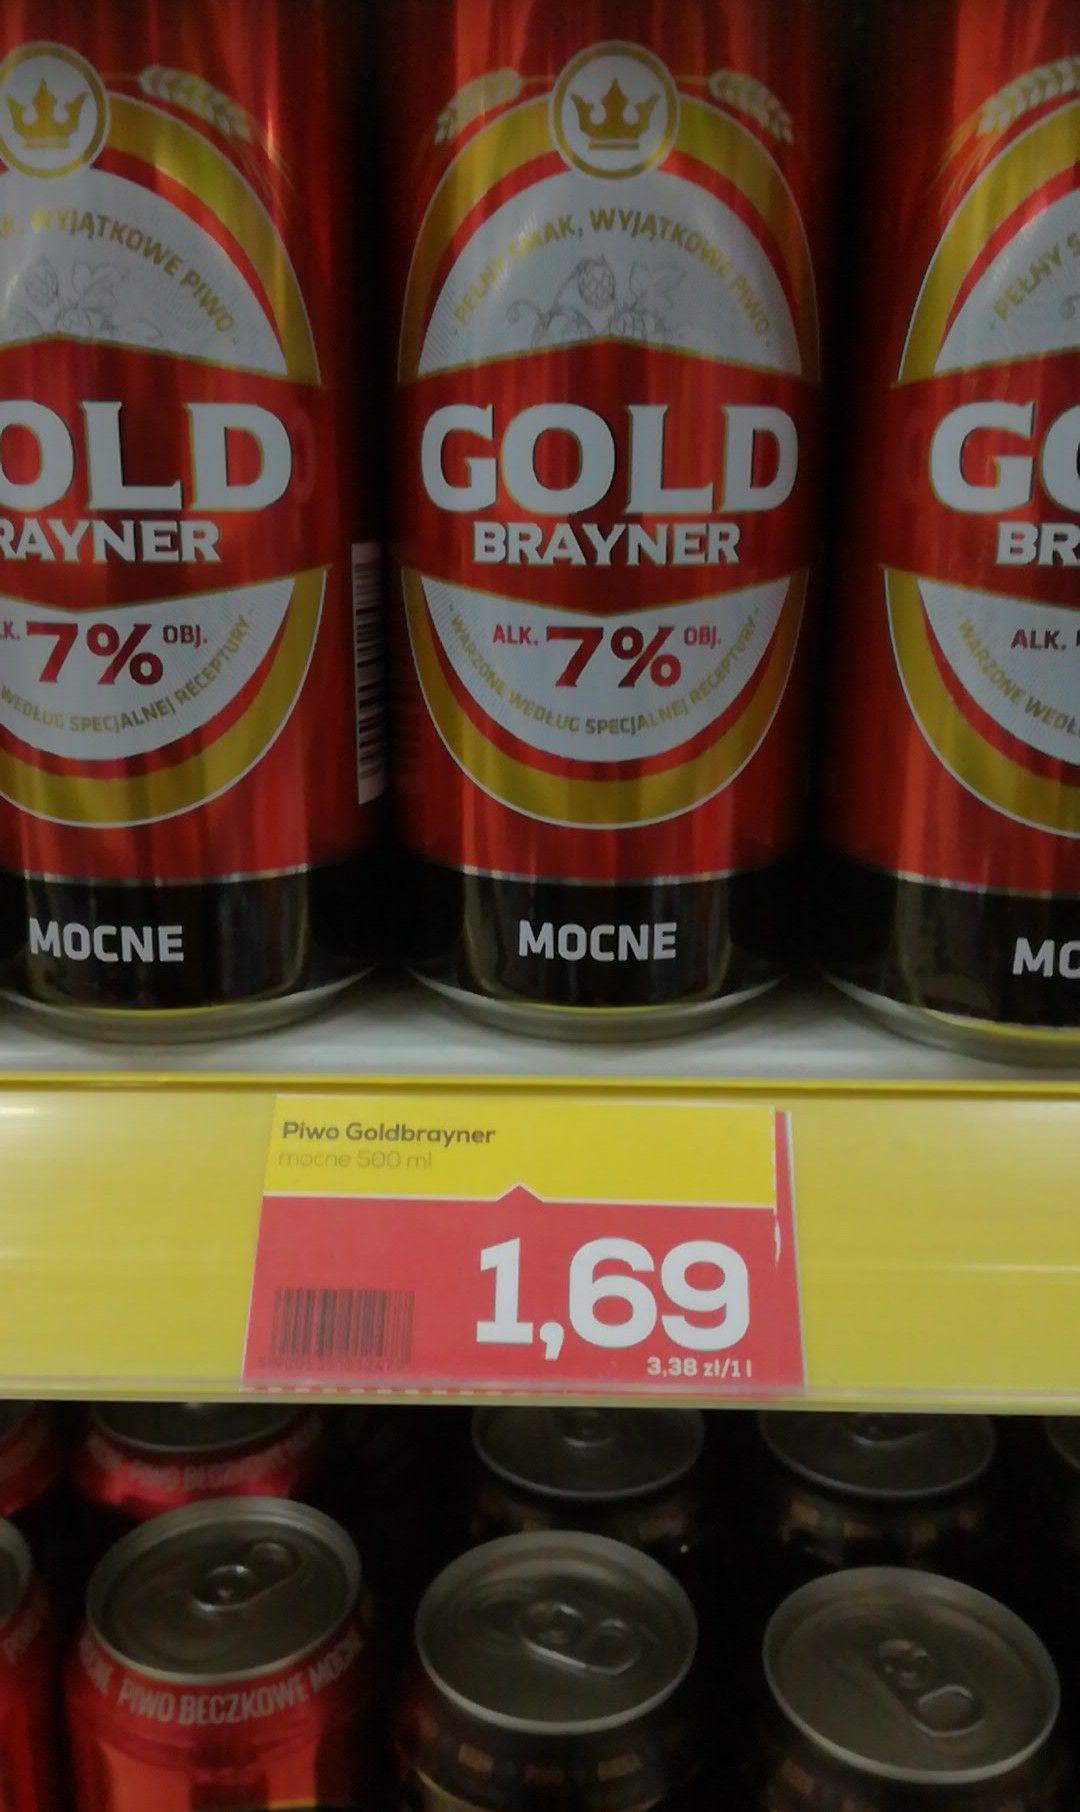 Piwo Gold Brayner Mocne Lewiatan